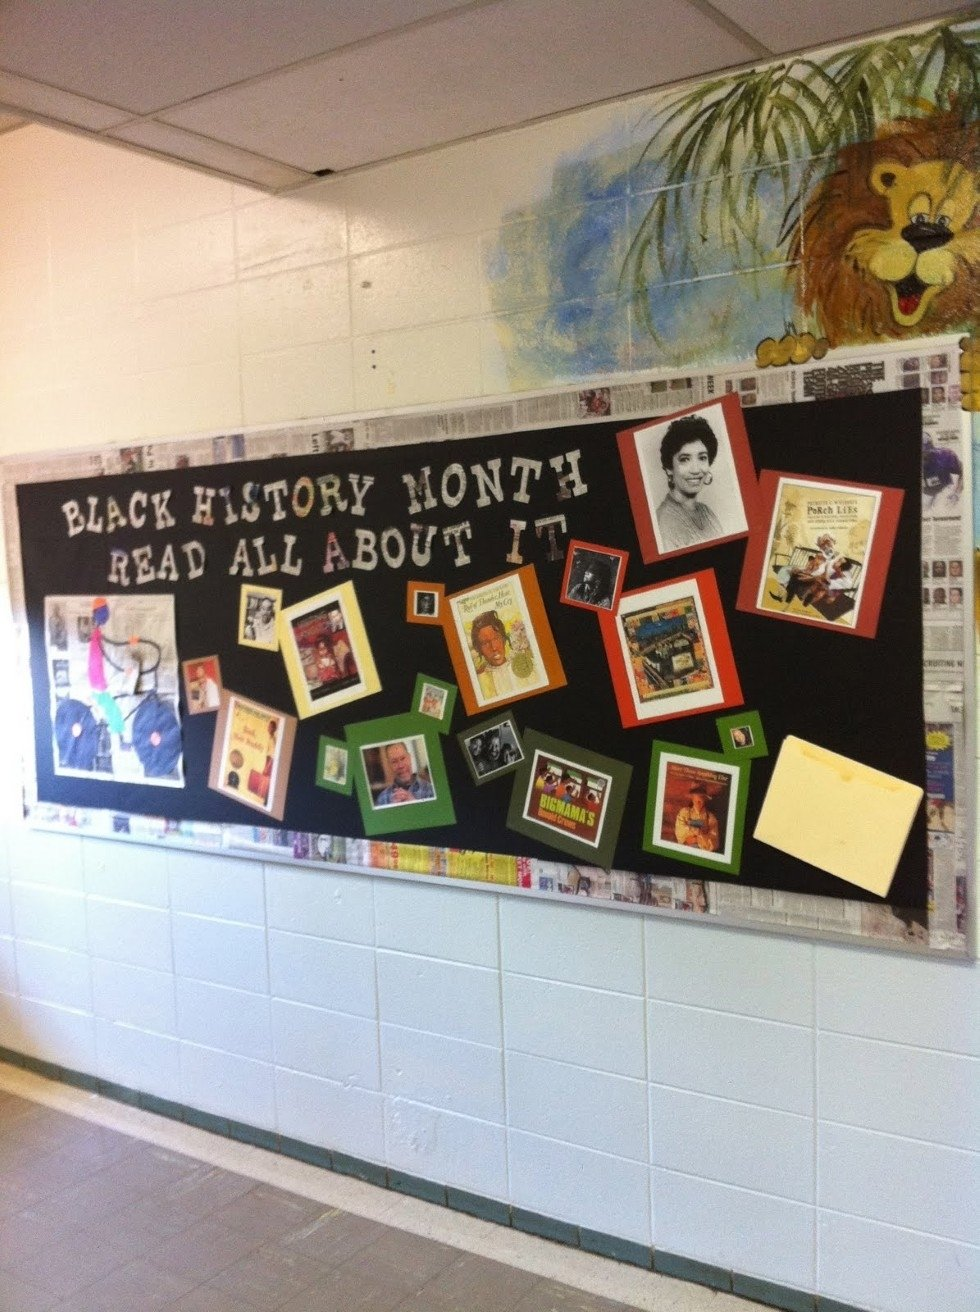 10 Unique Black History Bulletin Board Ideas black history bulletin board ideas bulletin board ideas designs 2 2020